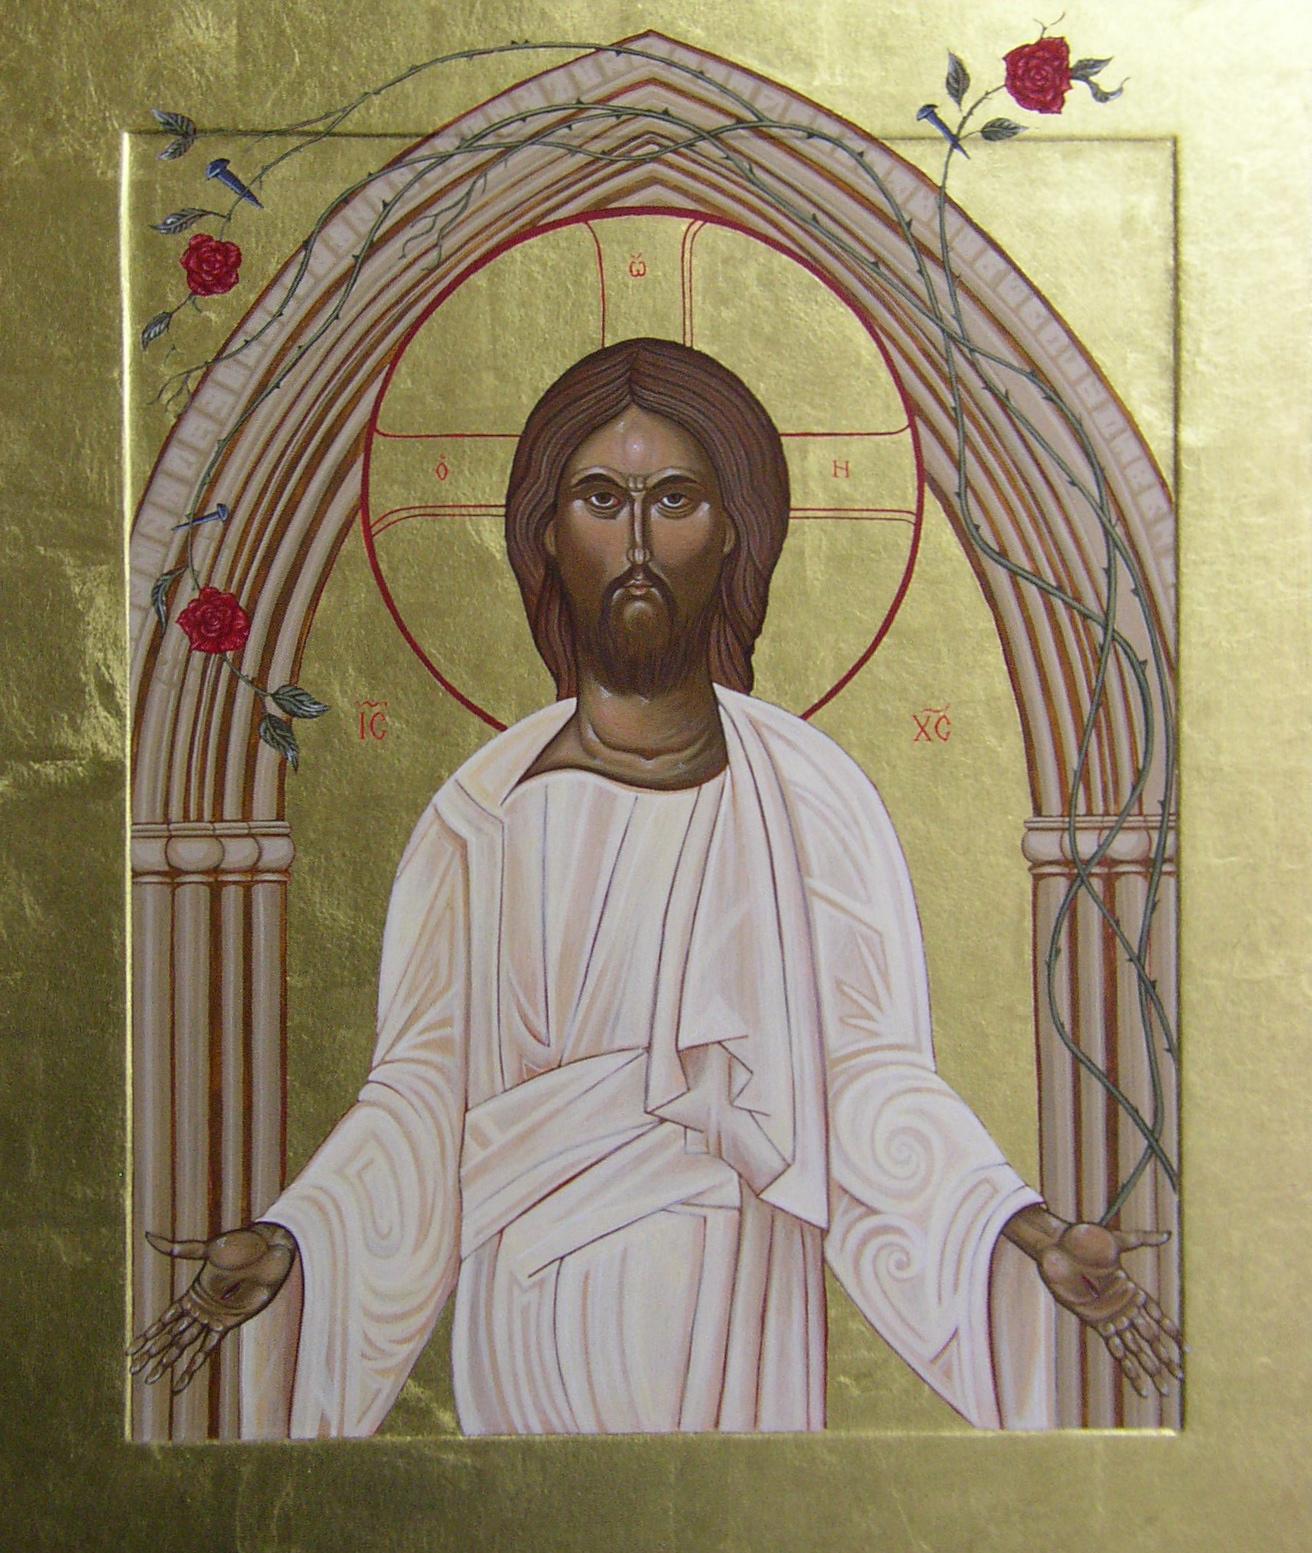 Saint Saviour. Tempera on gessoed panel 48 cm x 66 cm. Saint Saviour's Church Pimlico London. 2010